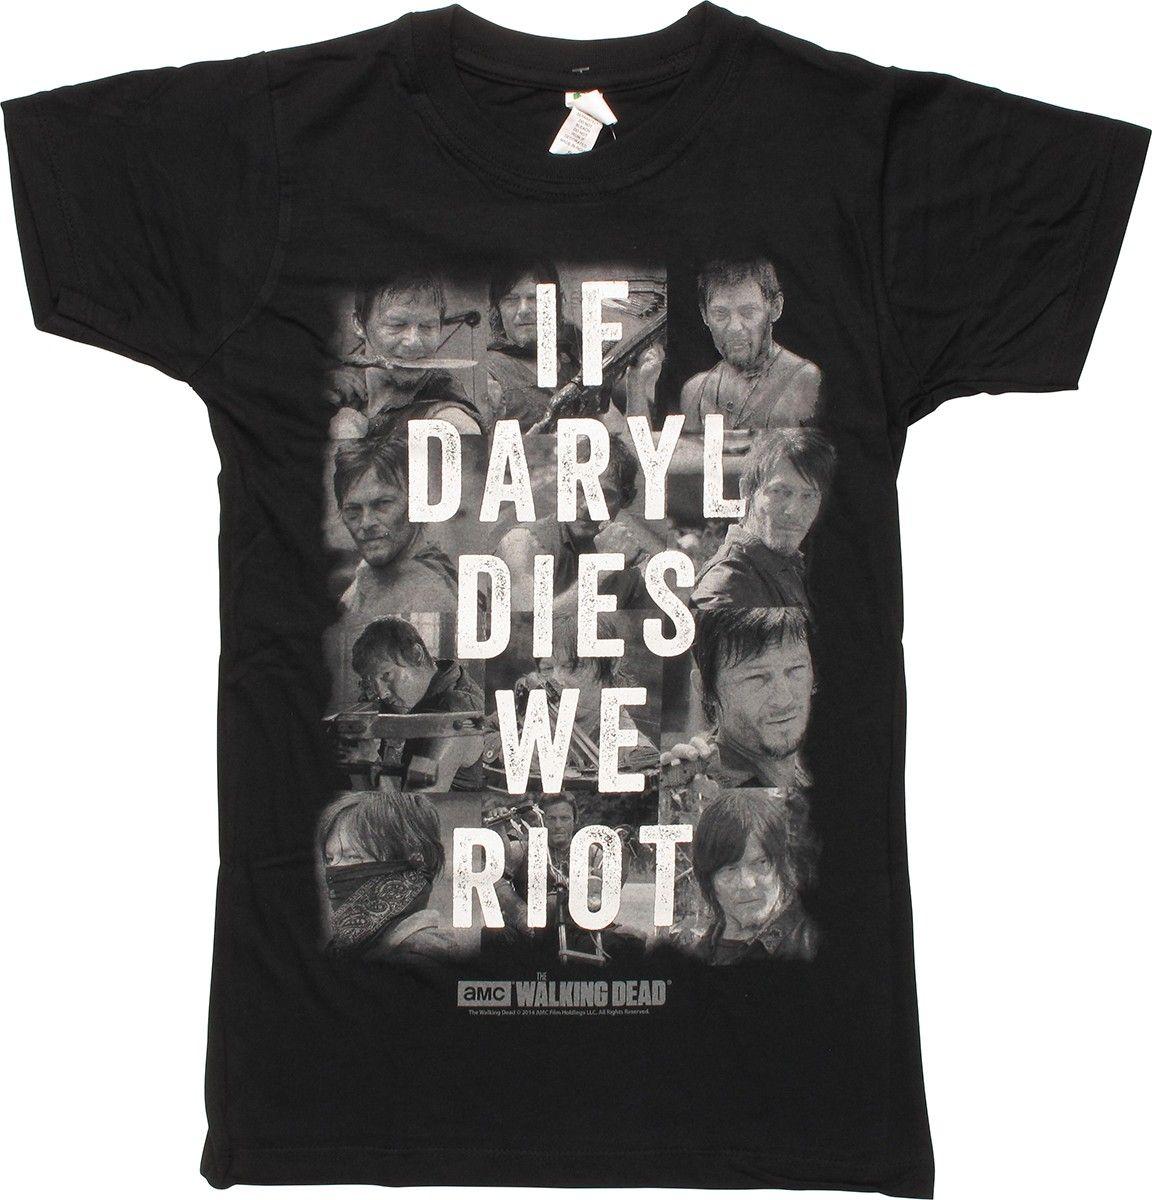 If daryl dies we riot t shirt uk